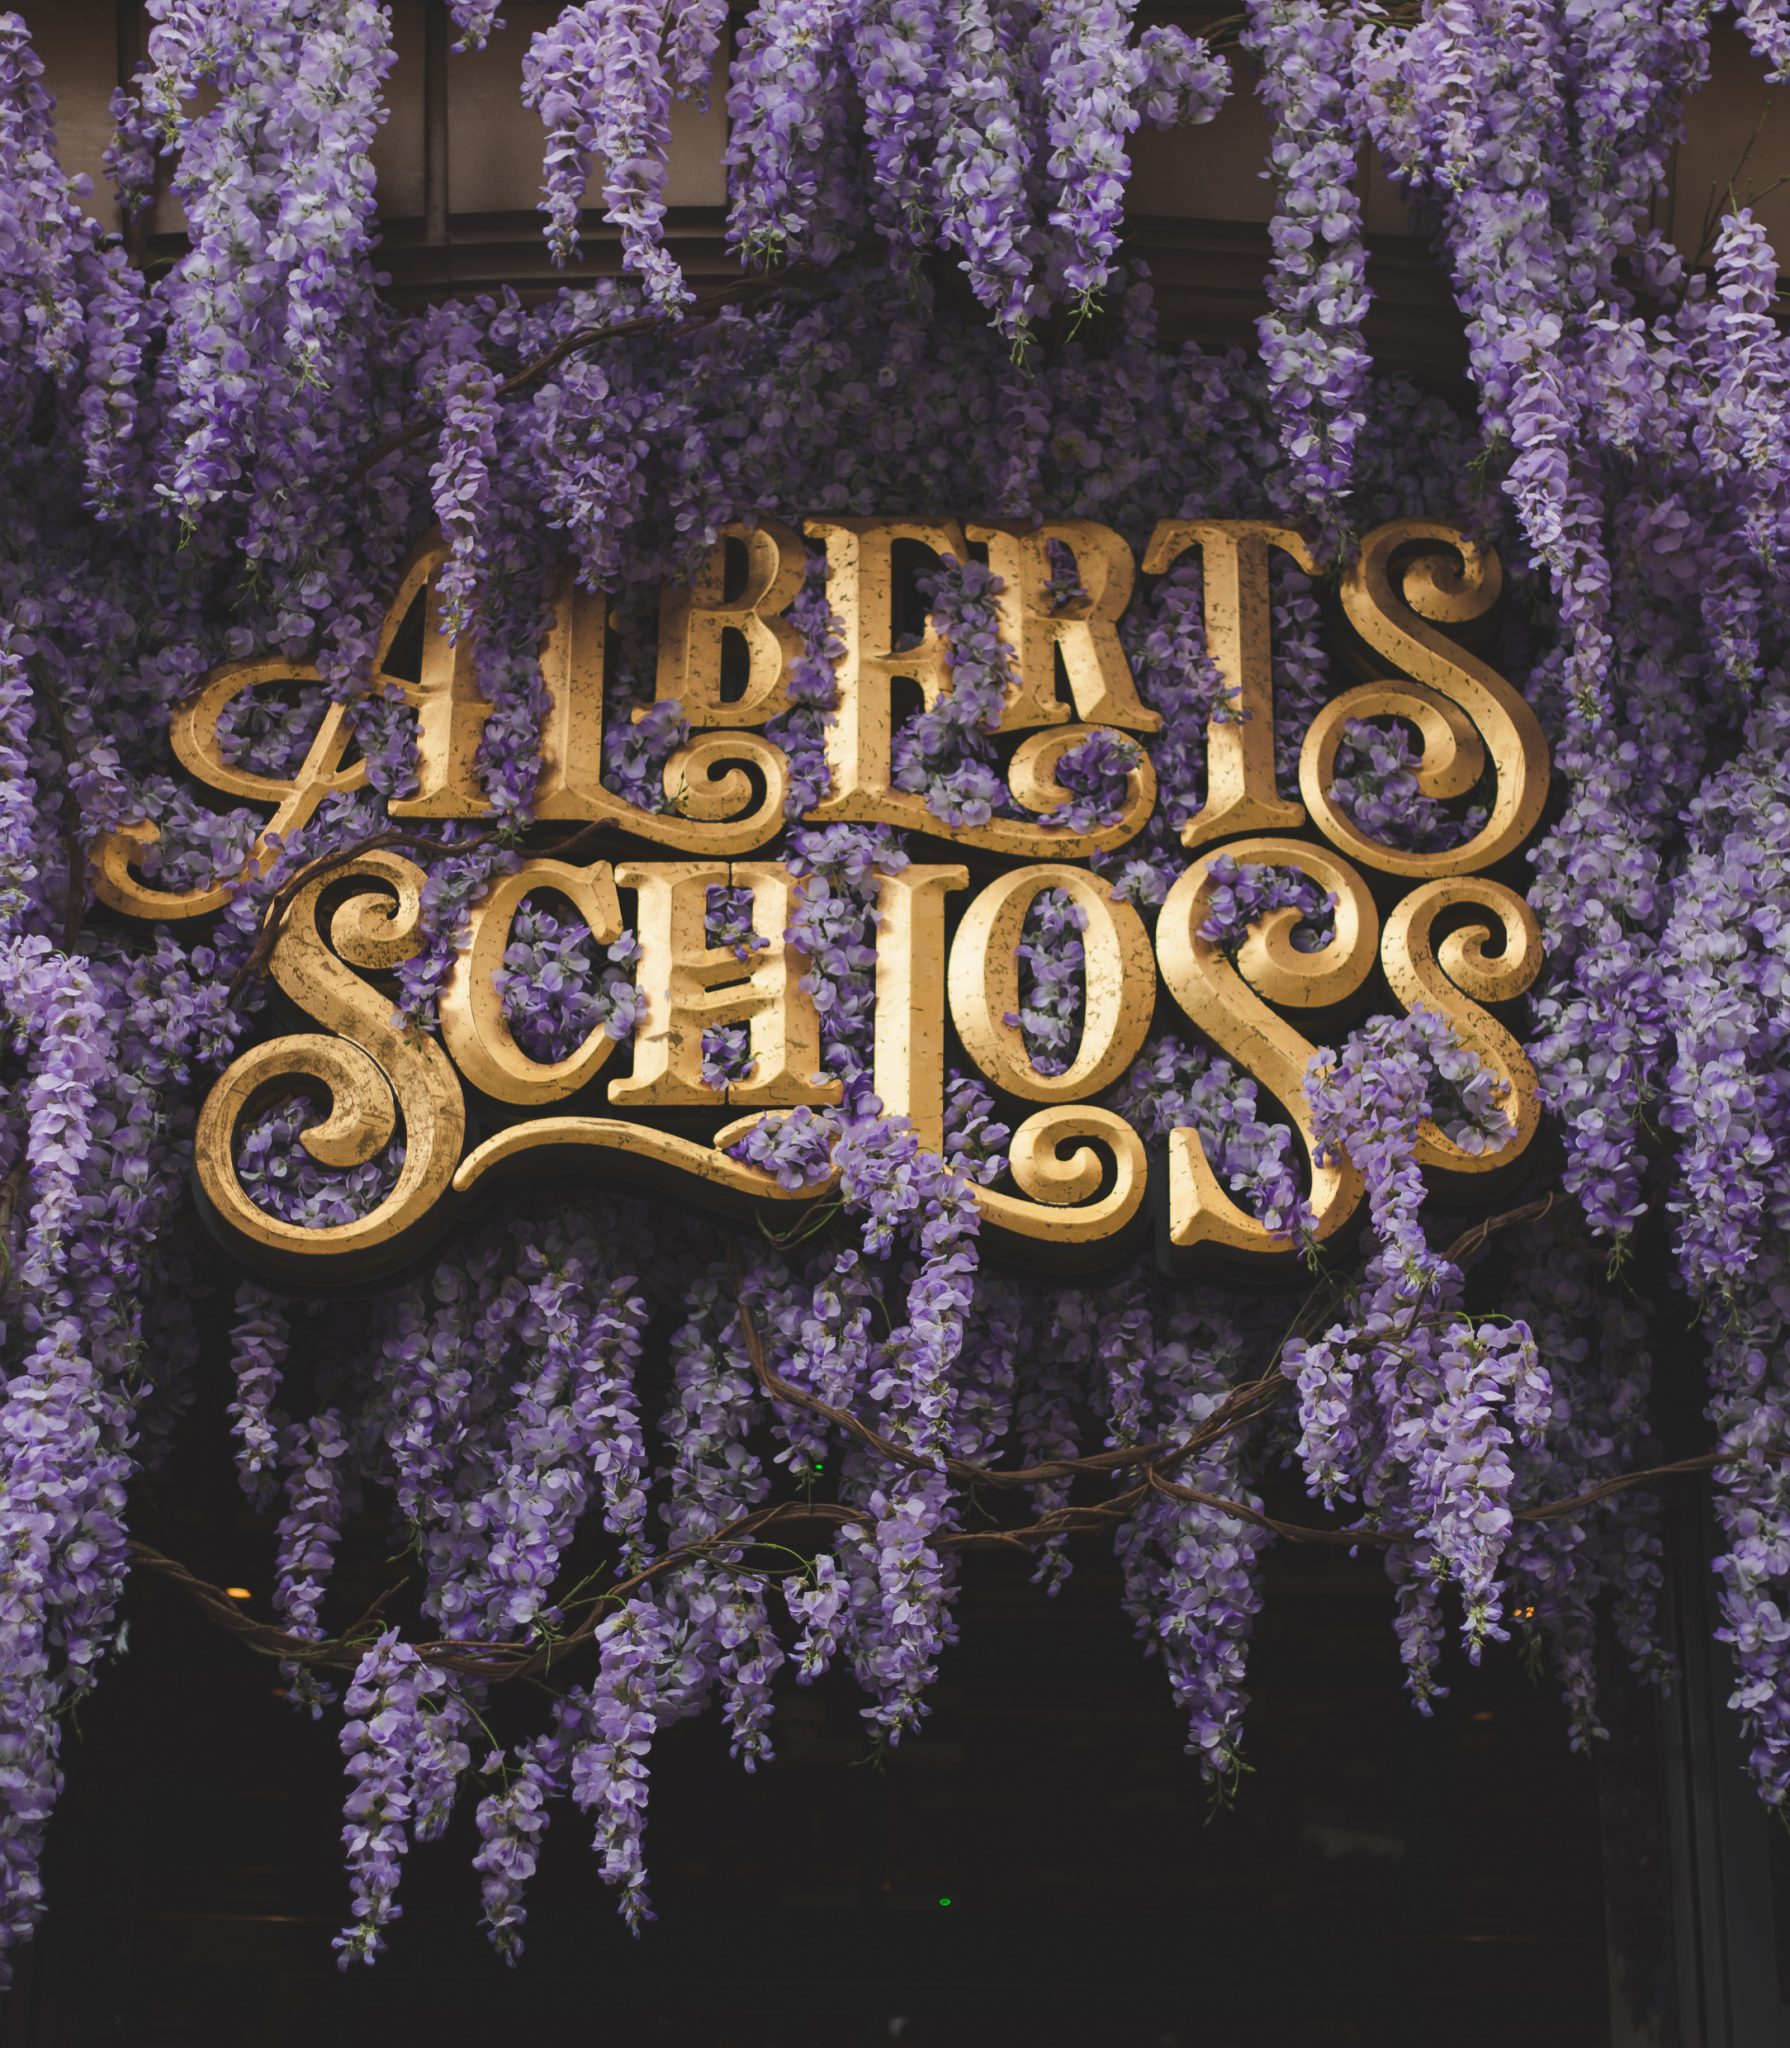 Wisteria Extravaganza— Alberts Schloss